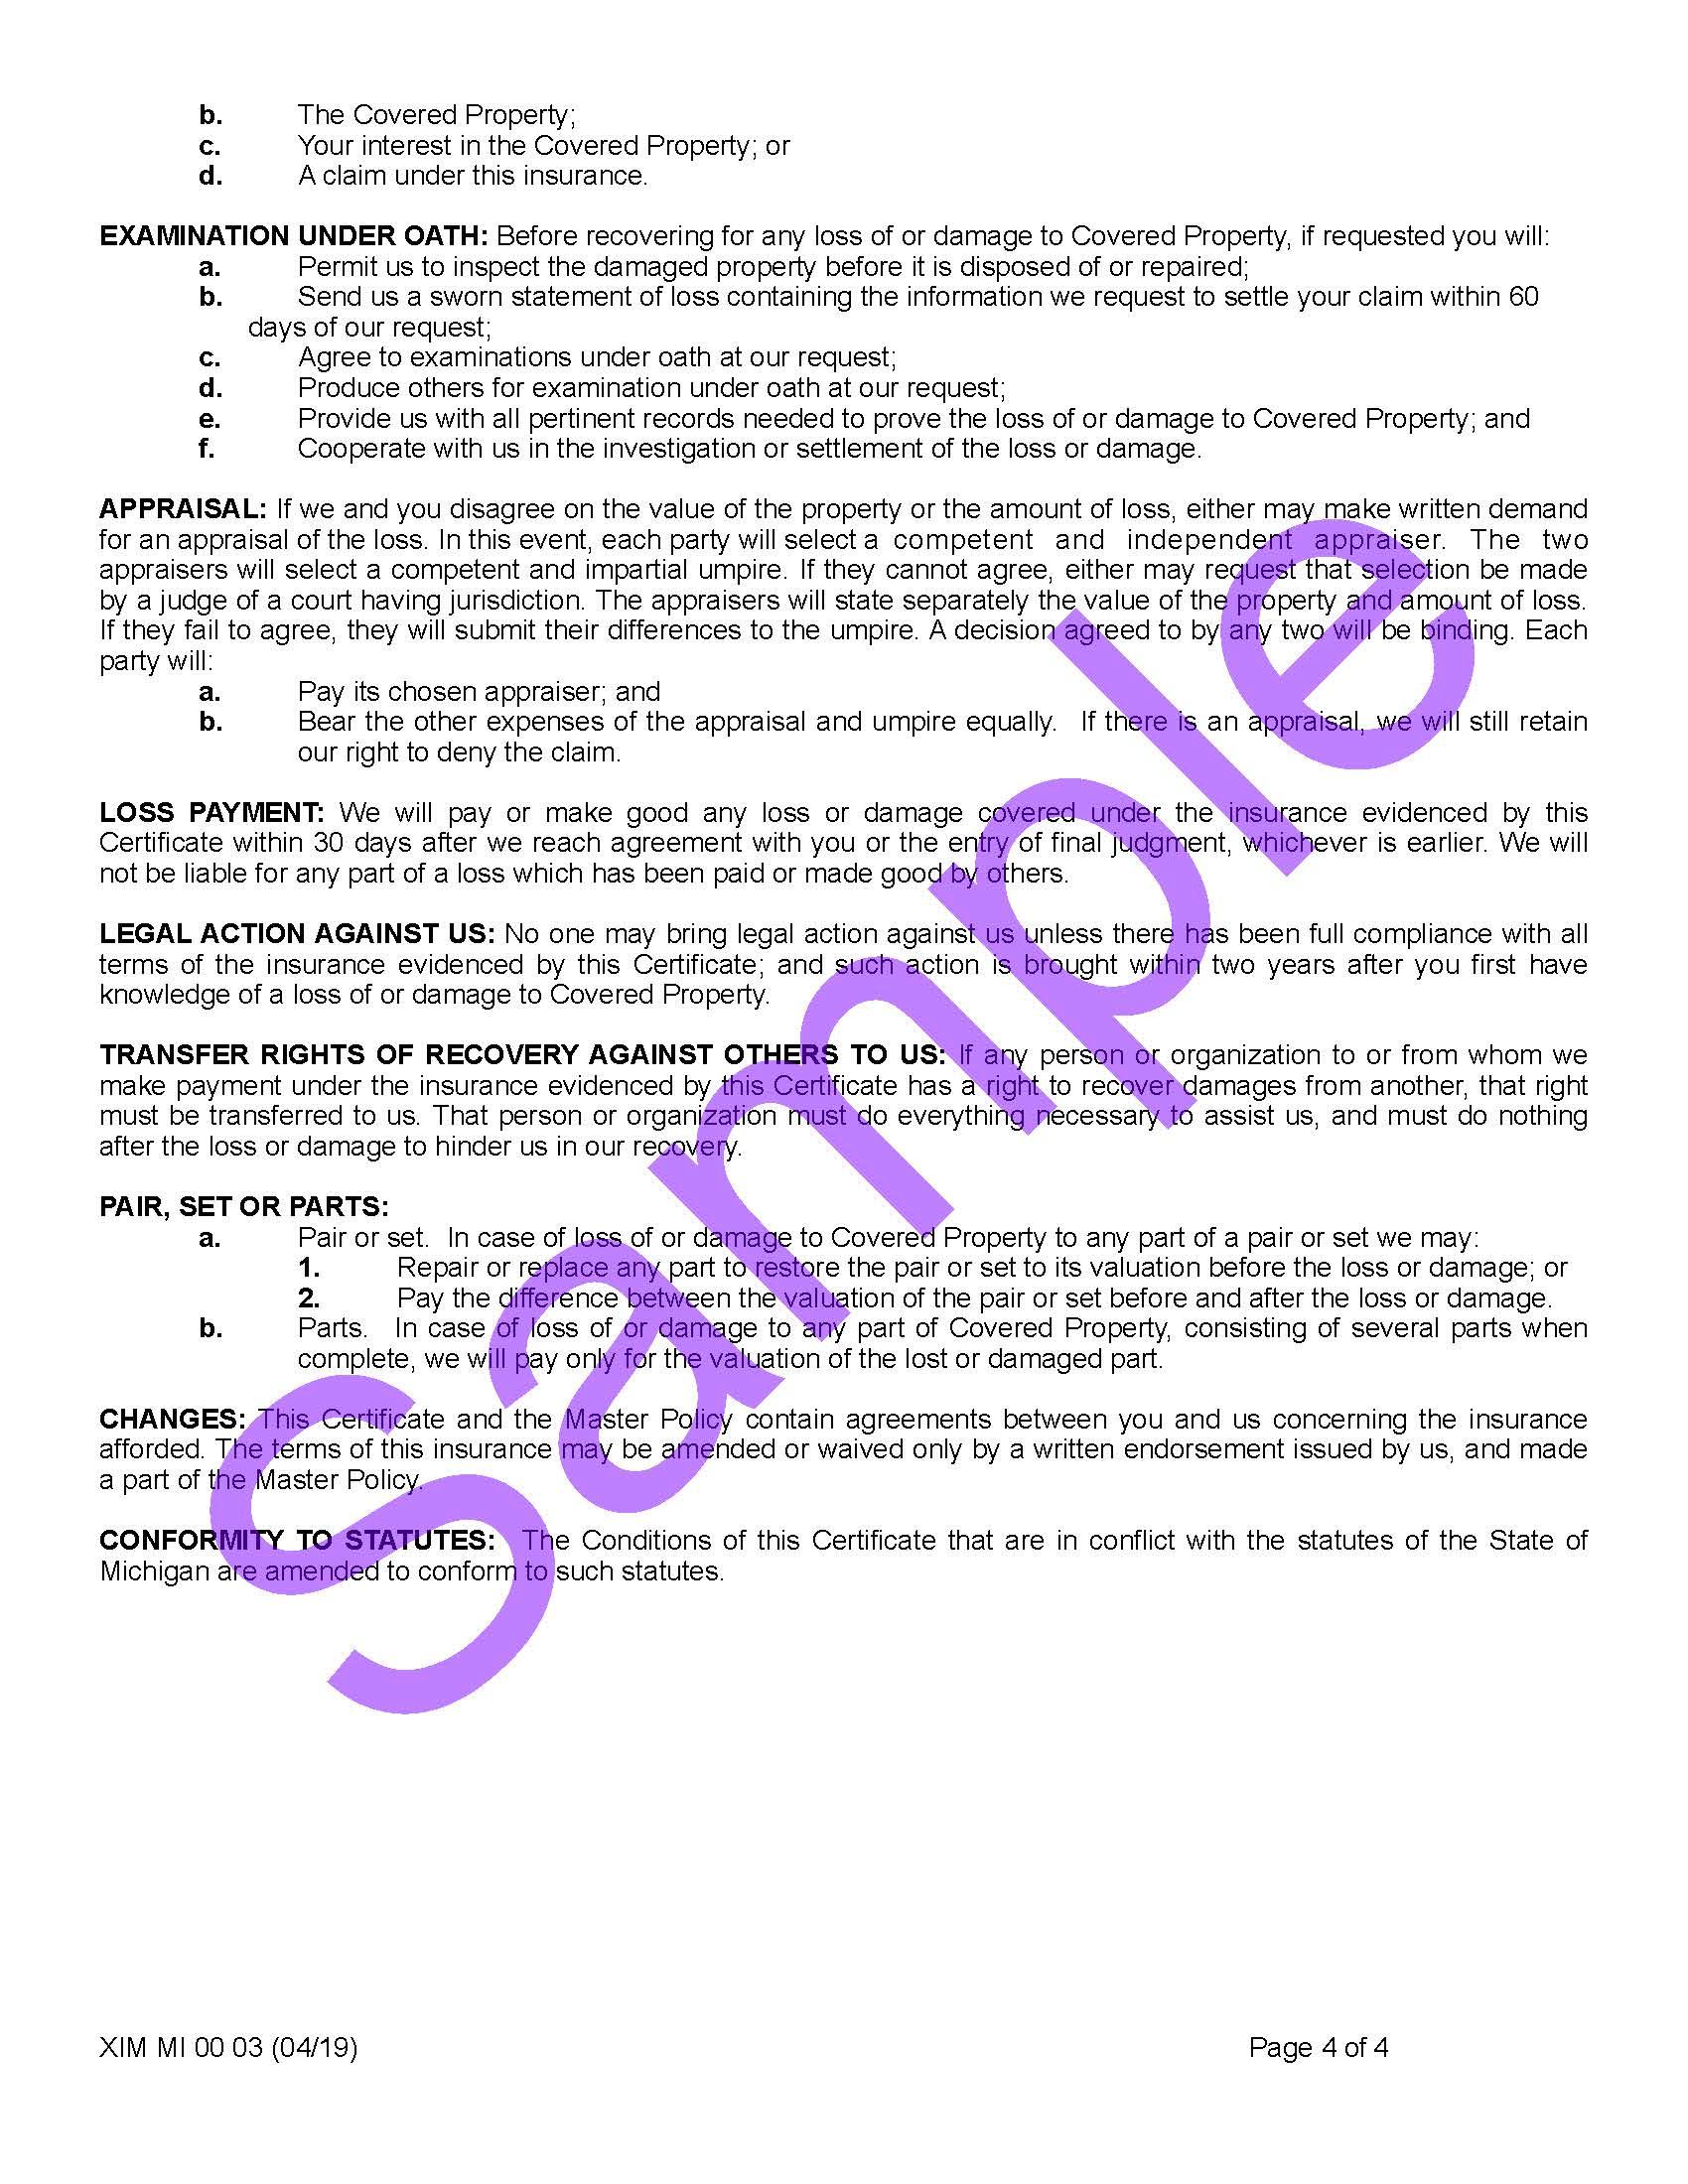 XIM MI 00 03 04 19 Michigan Certificate of InsuranceSample_Page_4.jpg